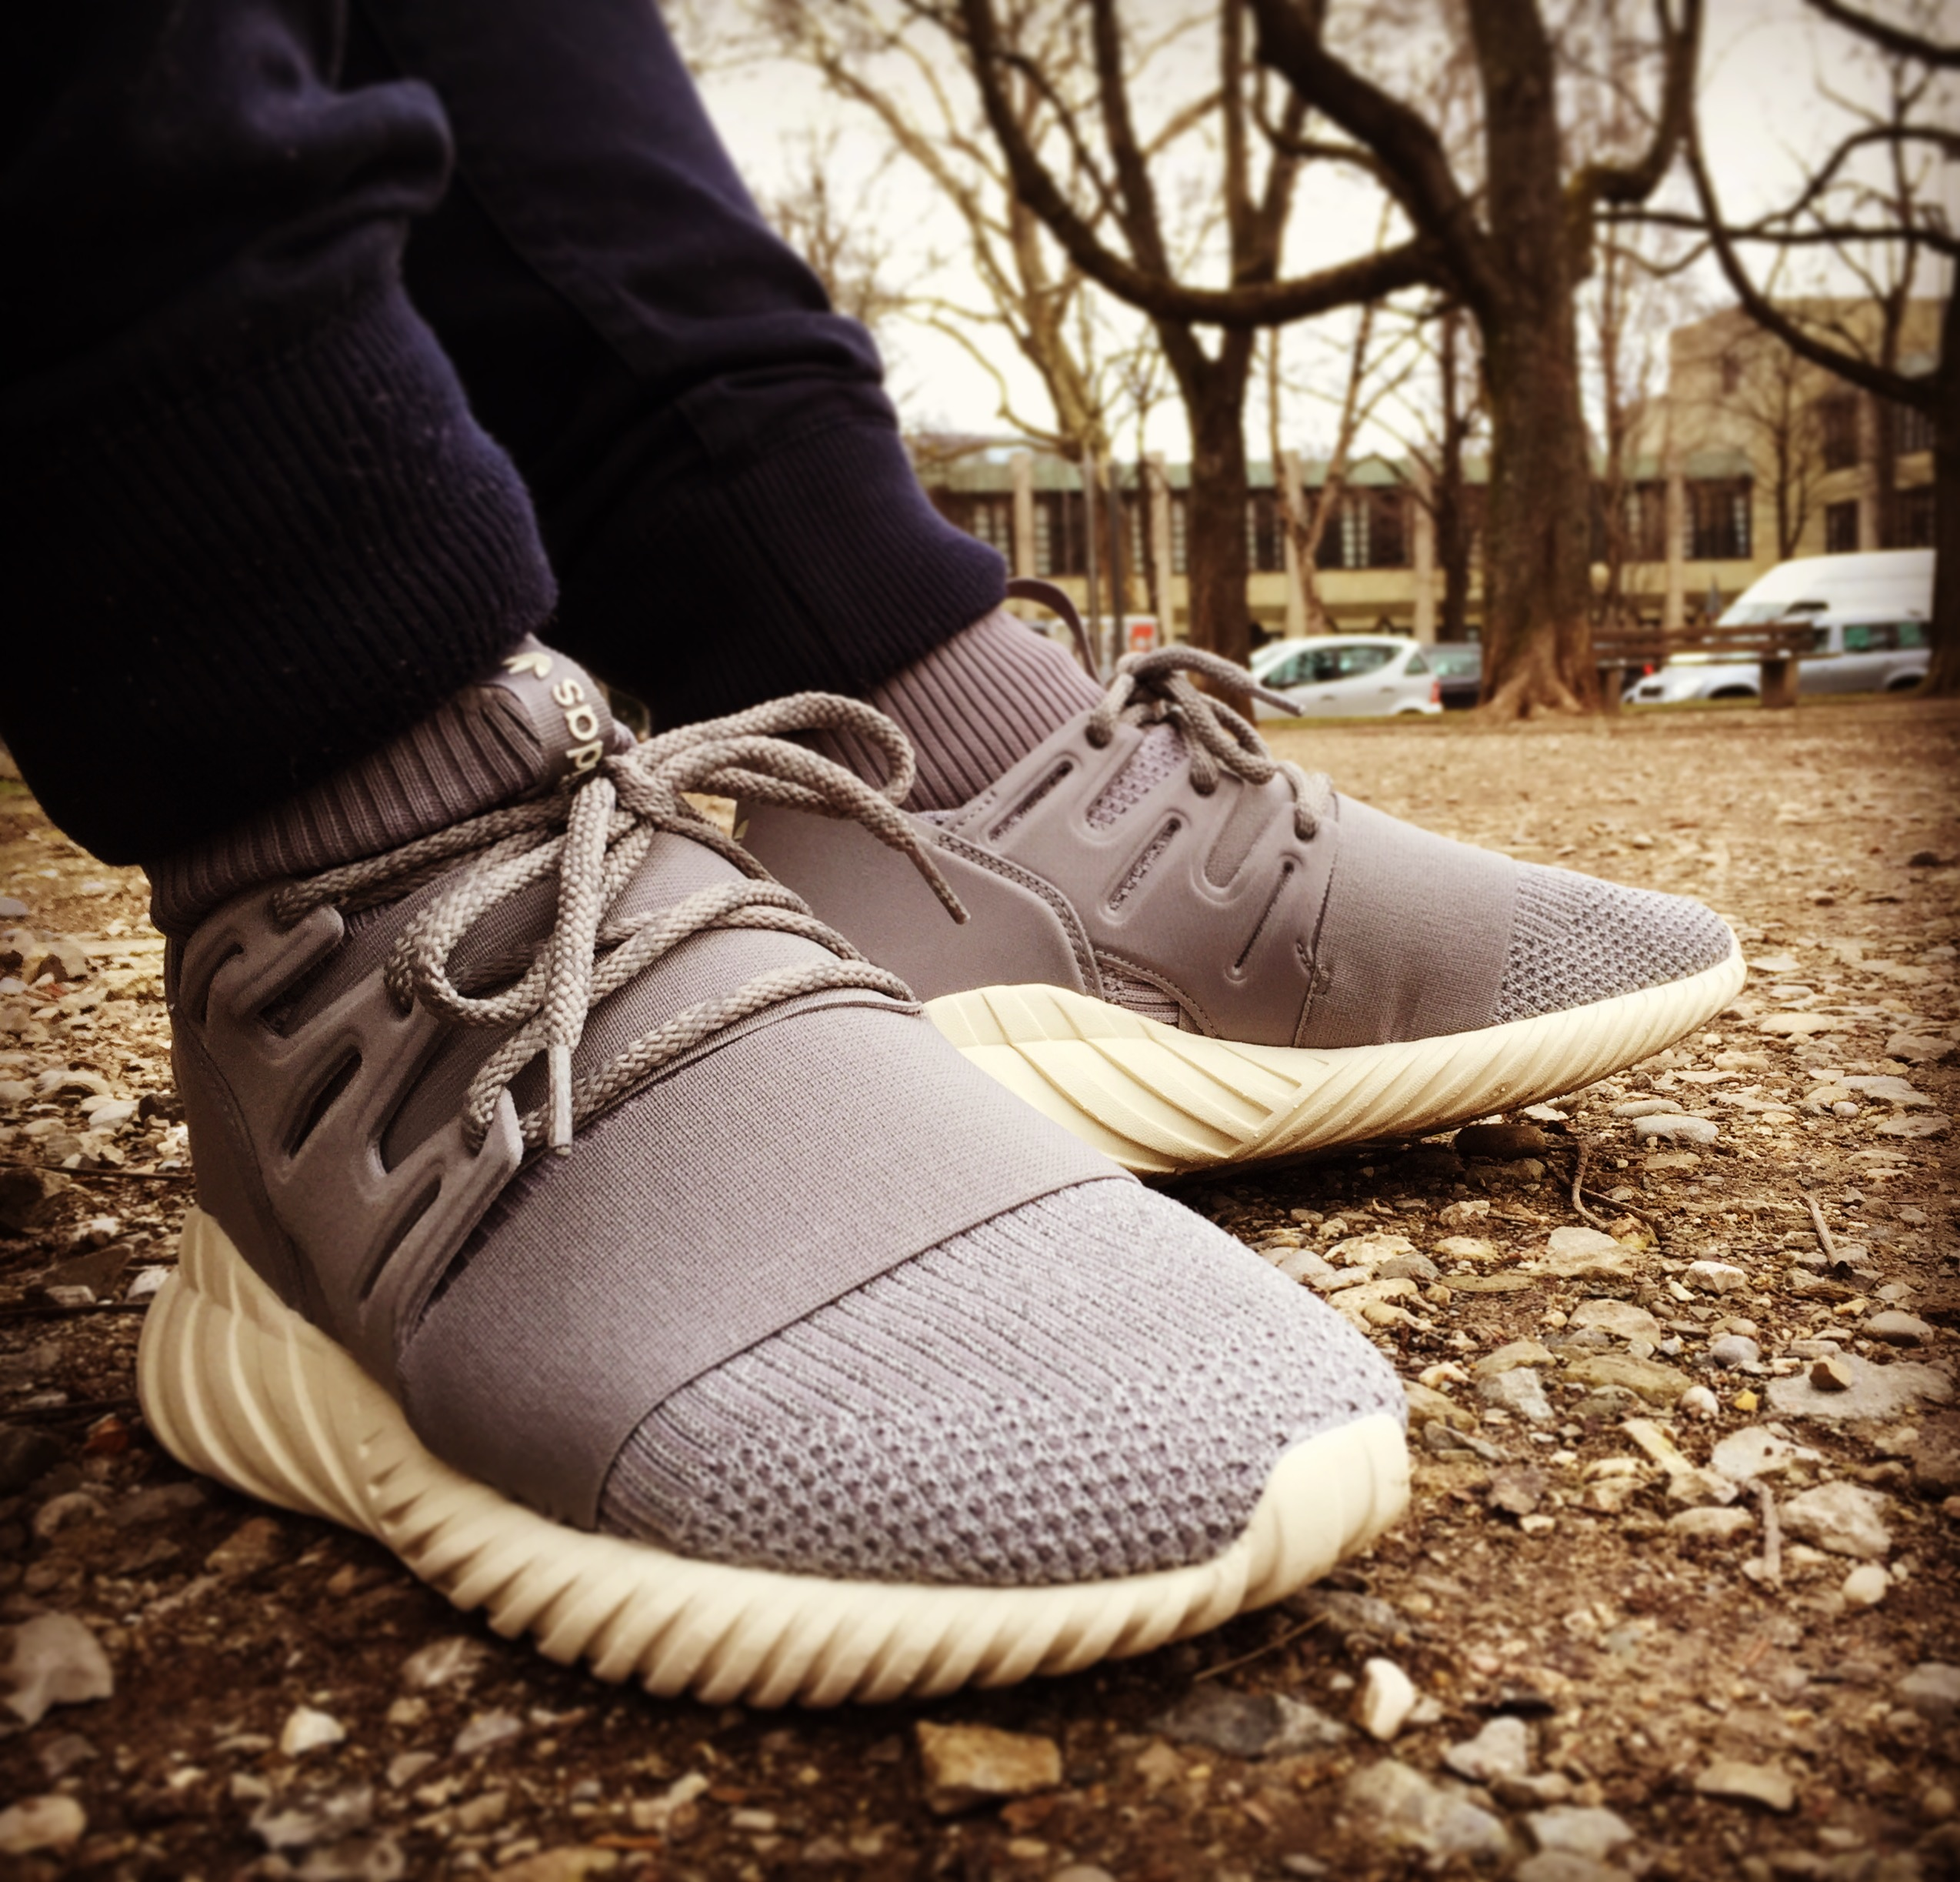 Adidas-Tubular-Doom-Reflective-Side-View-Benstah-Onfeet